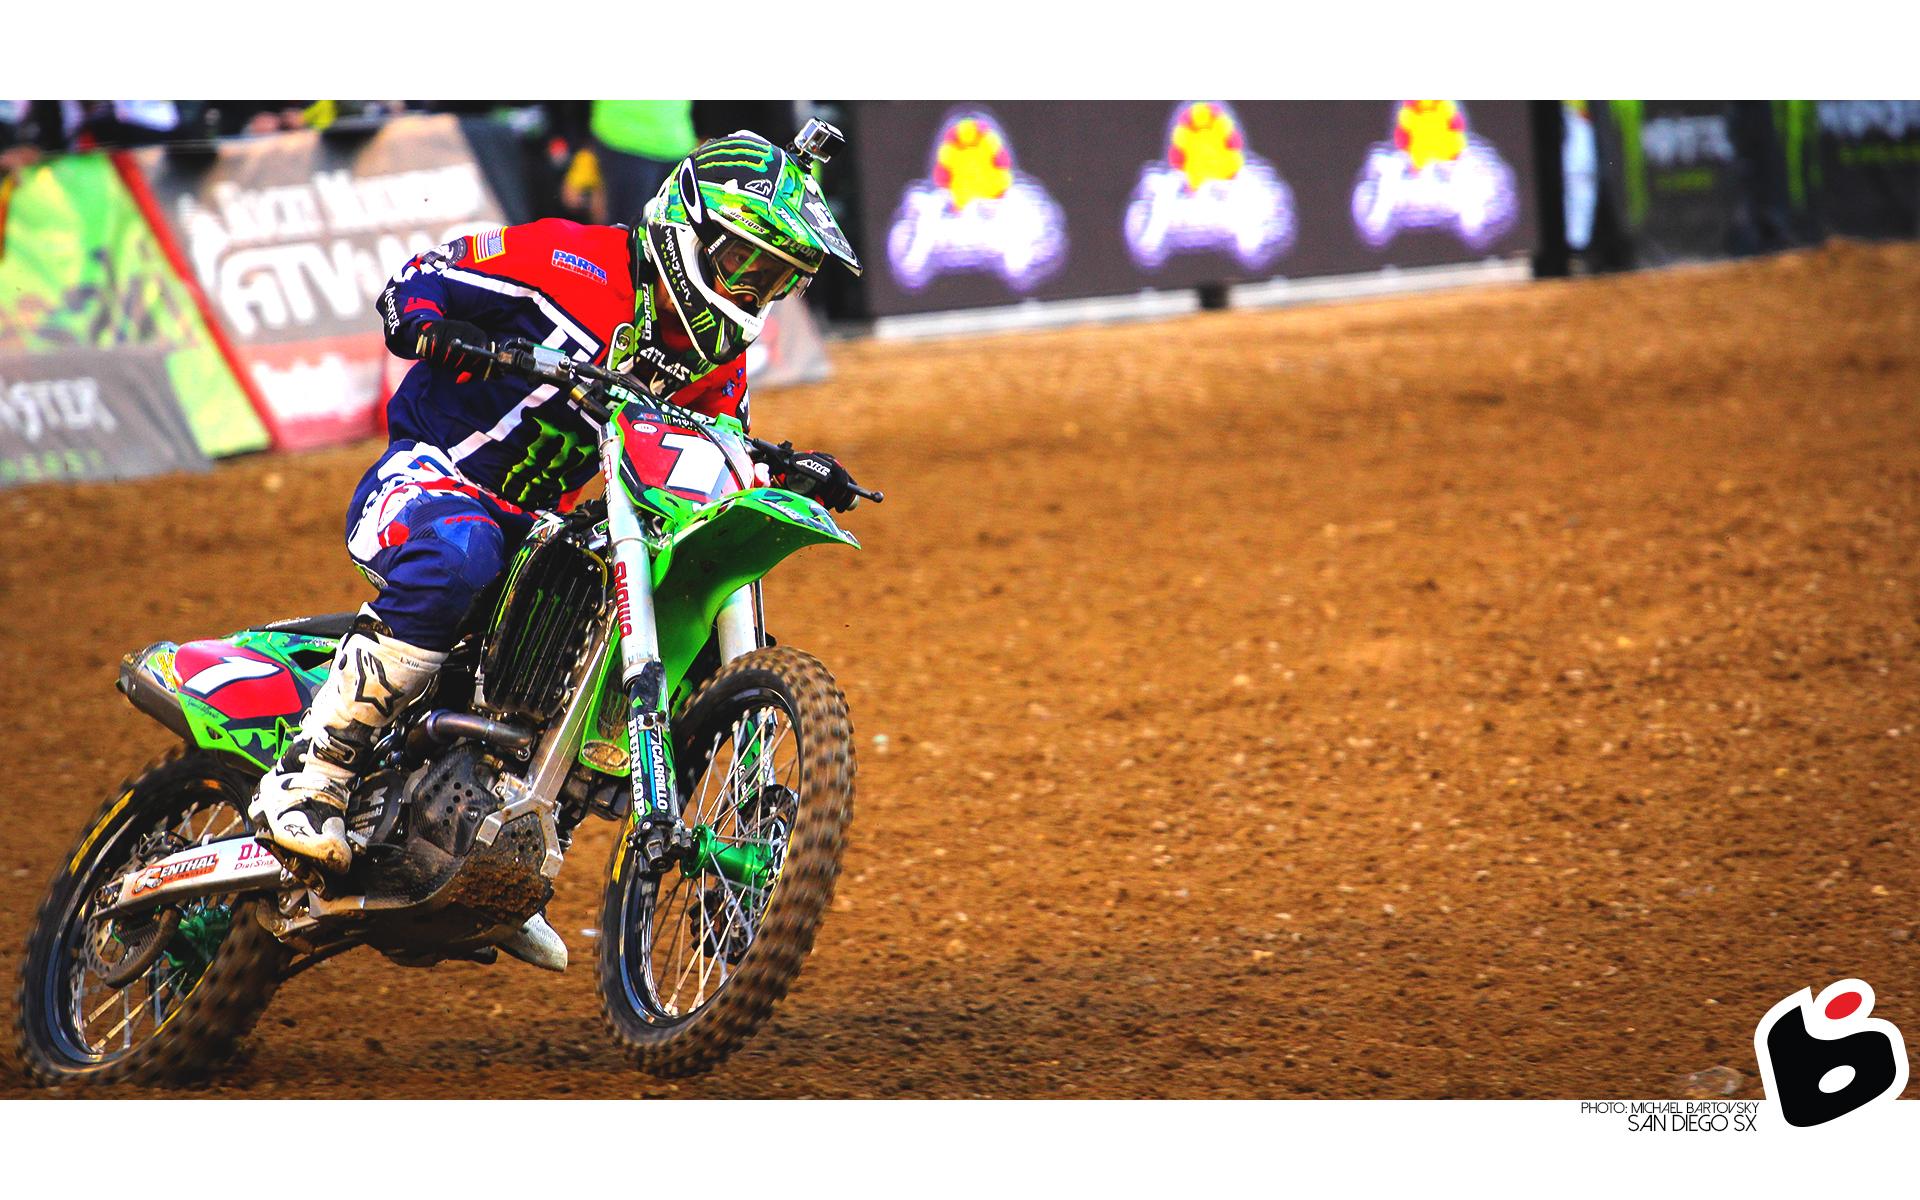 Ryan Villopoto   Motocross 1692499   HD Wallpaper Download 1920x1200